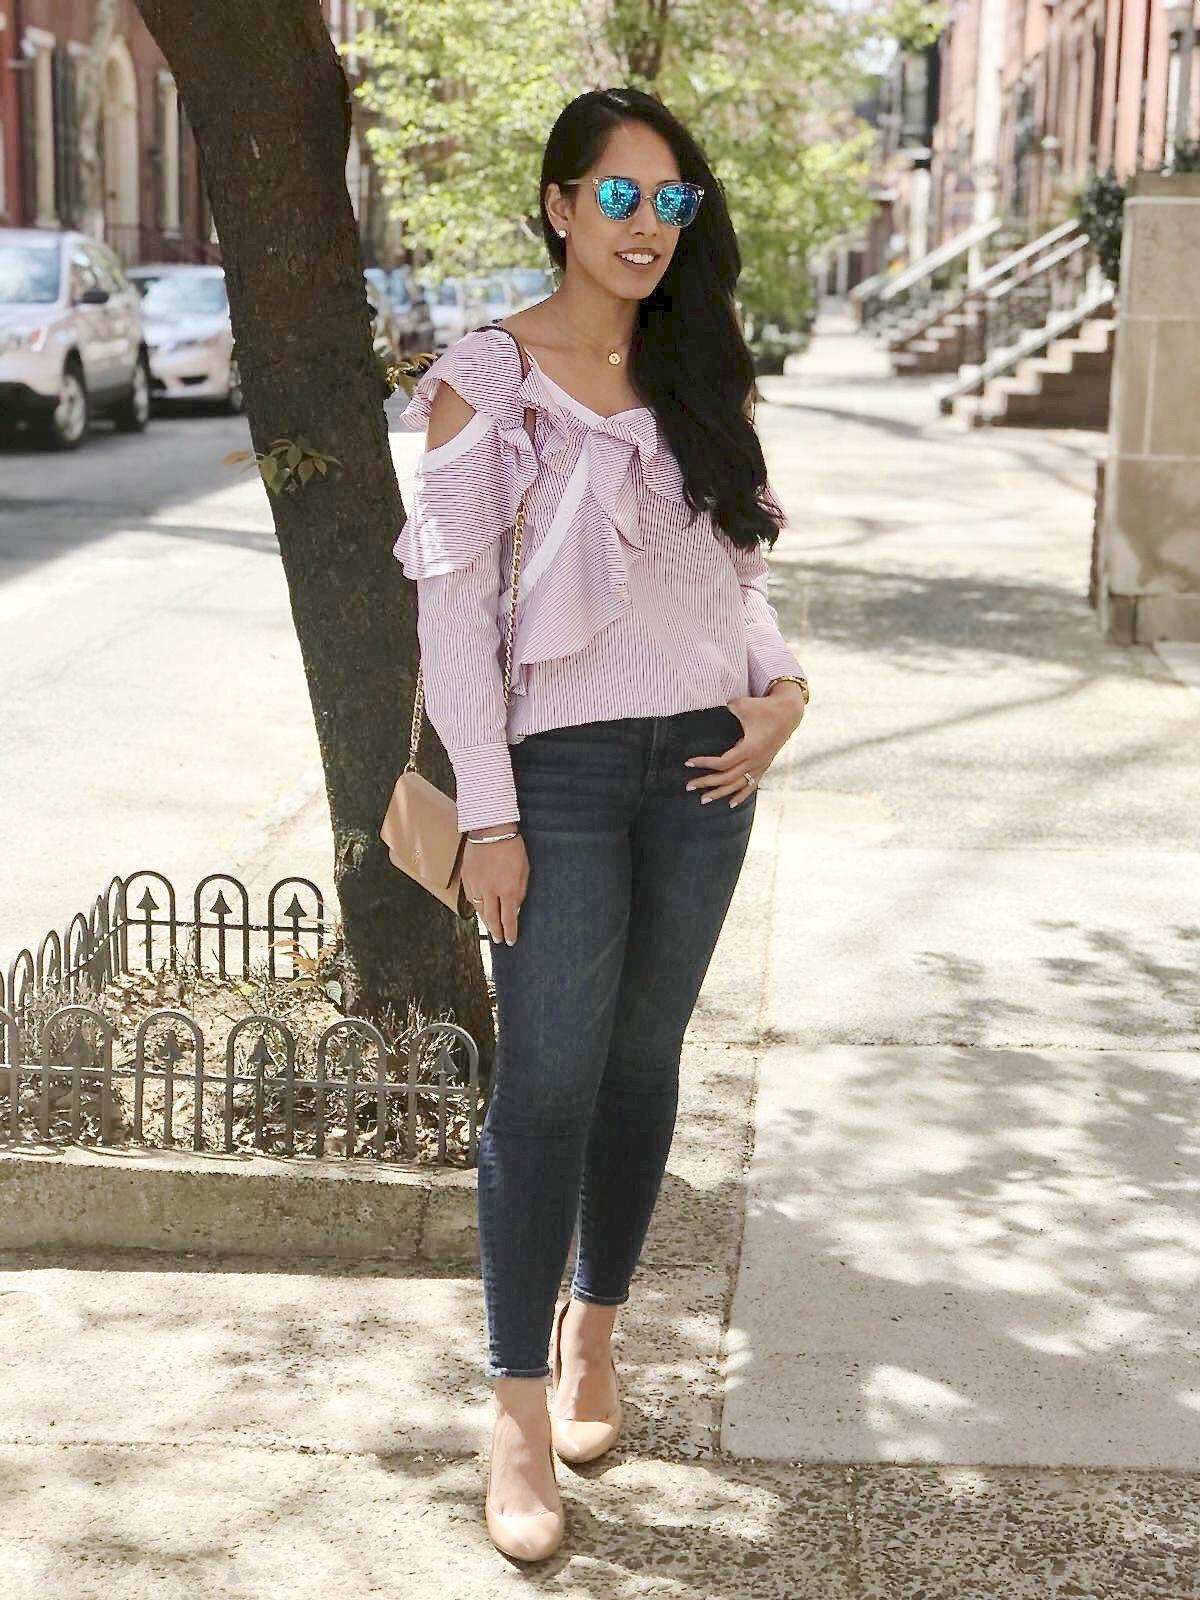 endless-rose-asymmetrical-top-revolve-spring-fashion.JPG